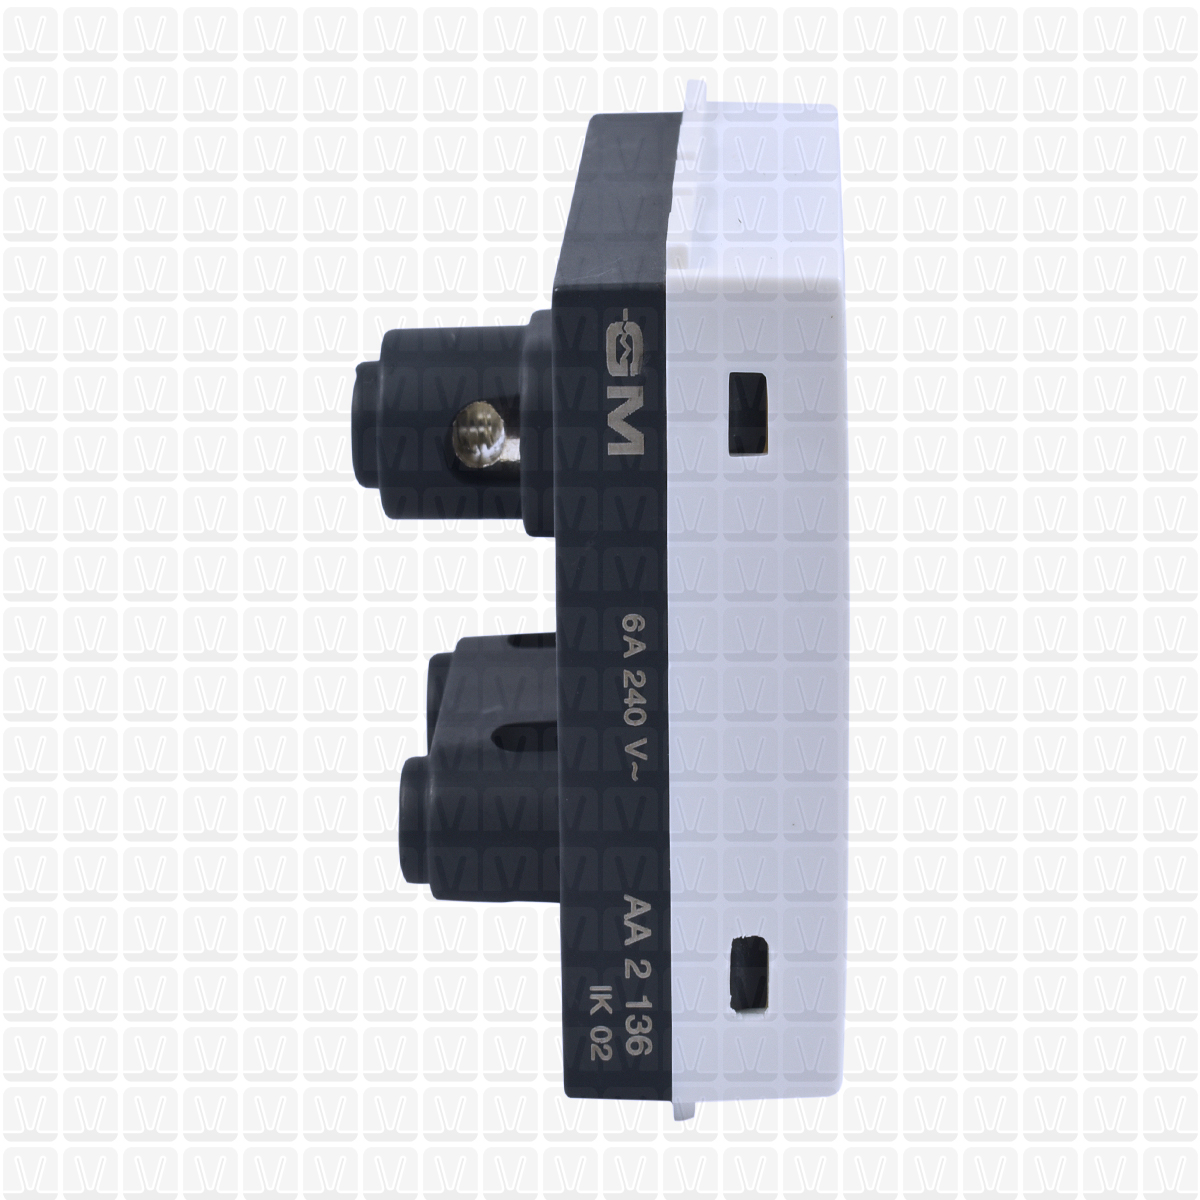 Gm White Socket 16 Amp Sockets Vardhman Shop